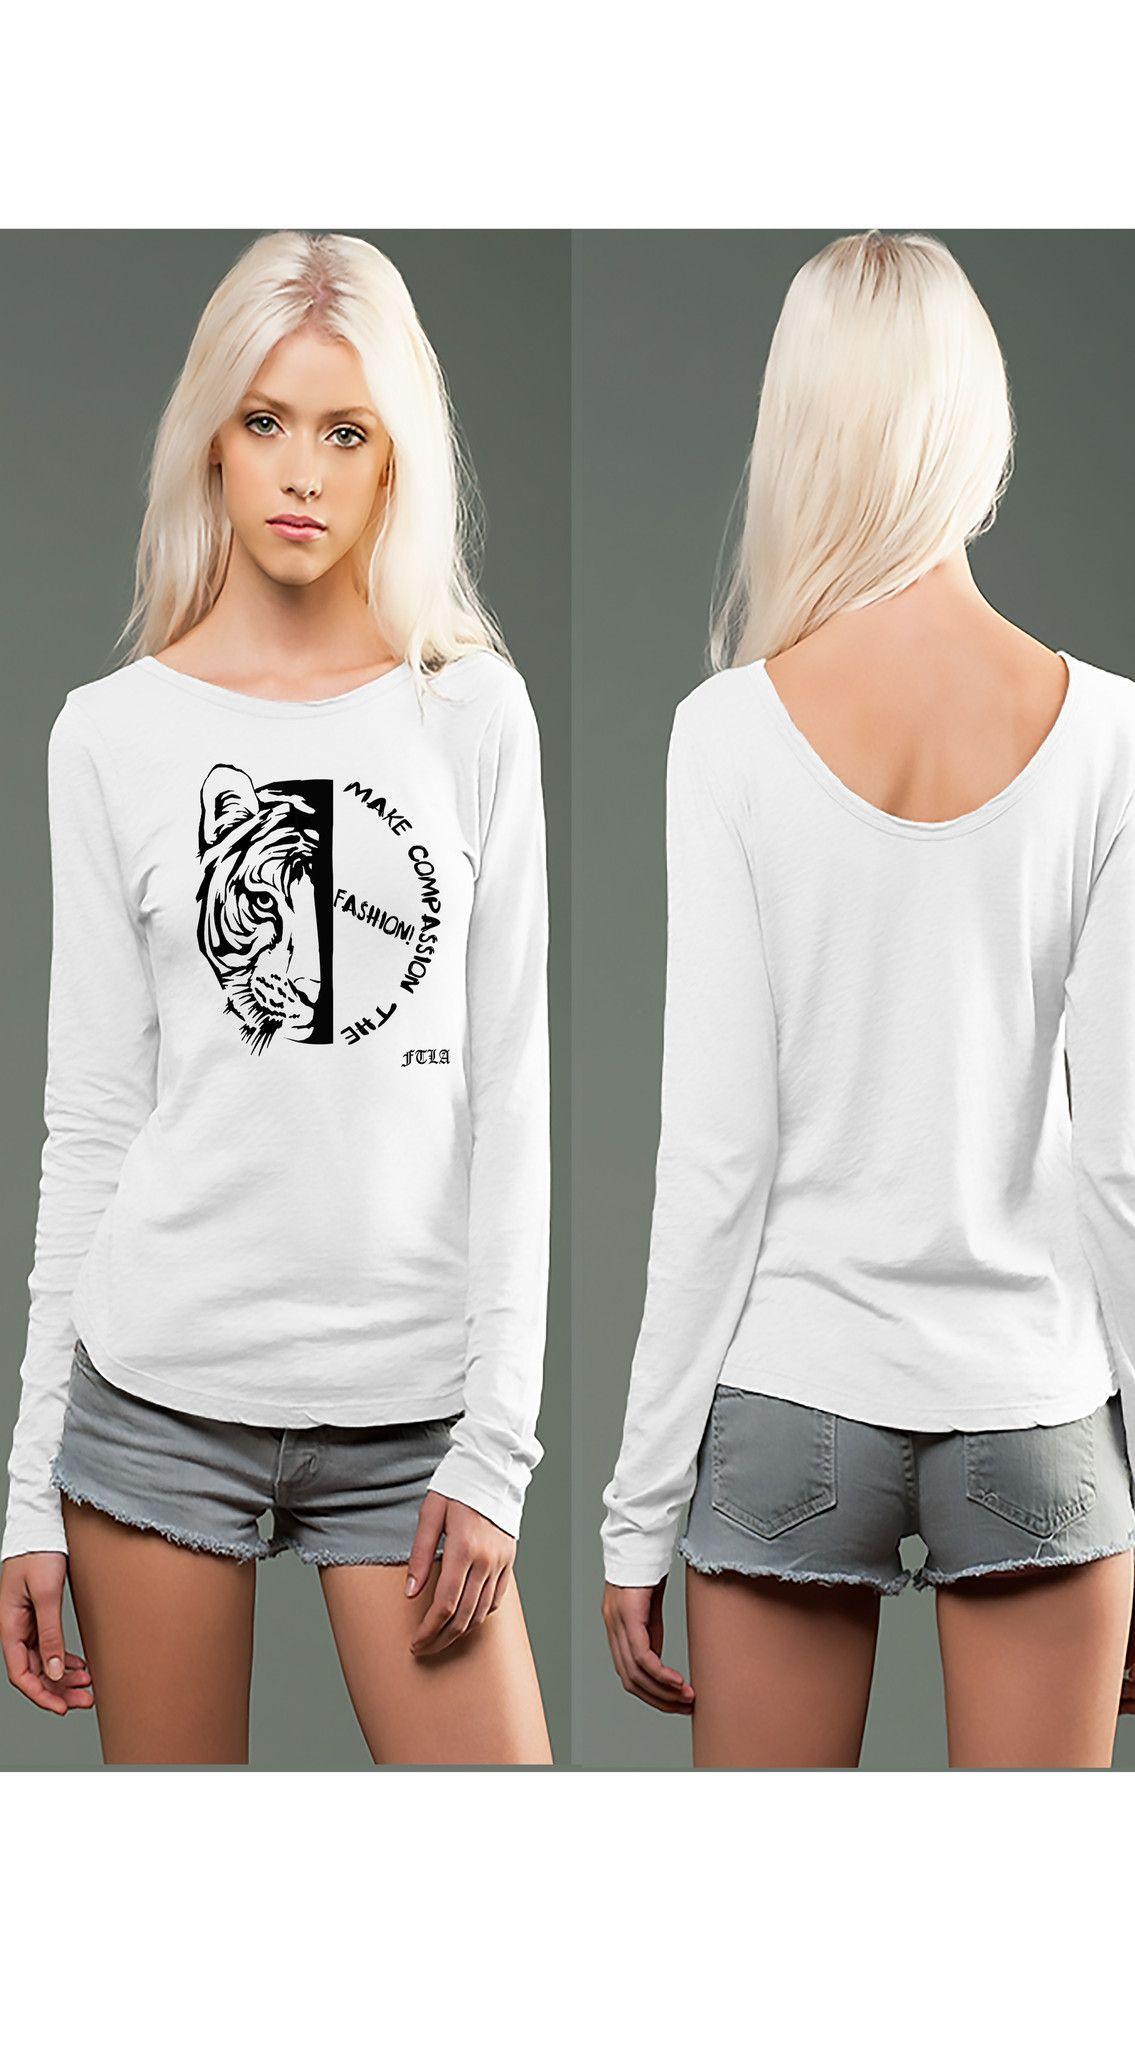 981652f1cf5 White eco-HYBRID™ Slub Micro Jersey Long Sleeve Scoop Back Tee - Make  Compassion The Fashion!!